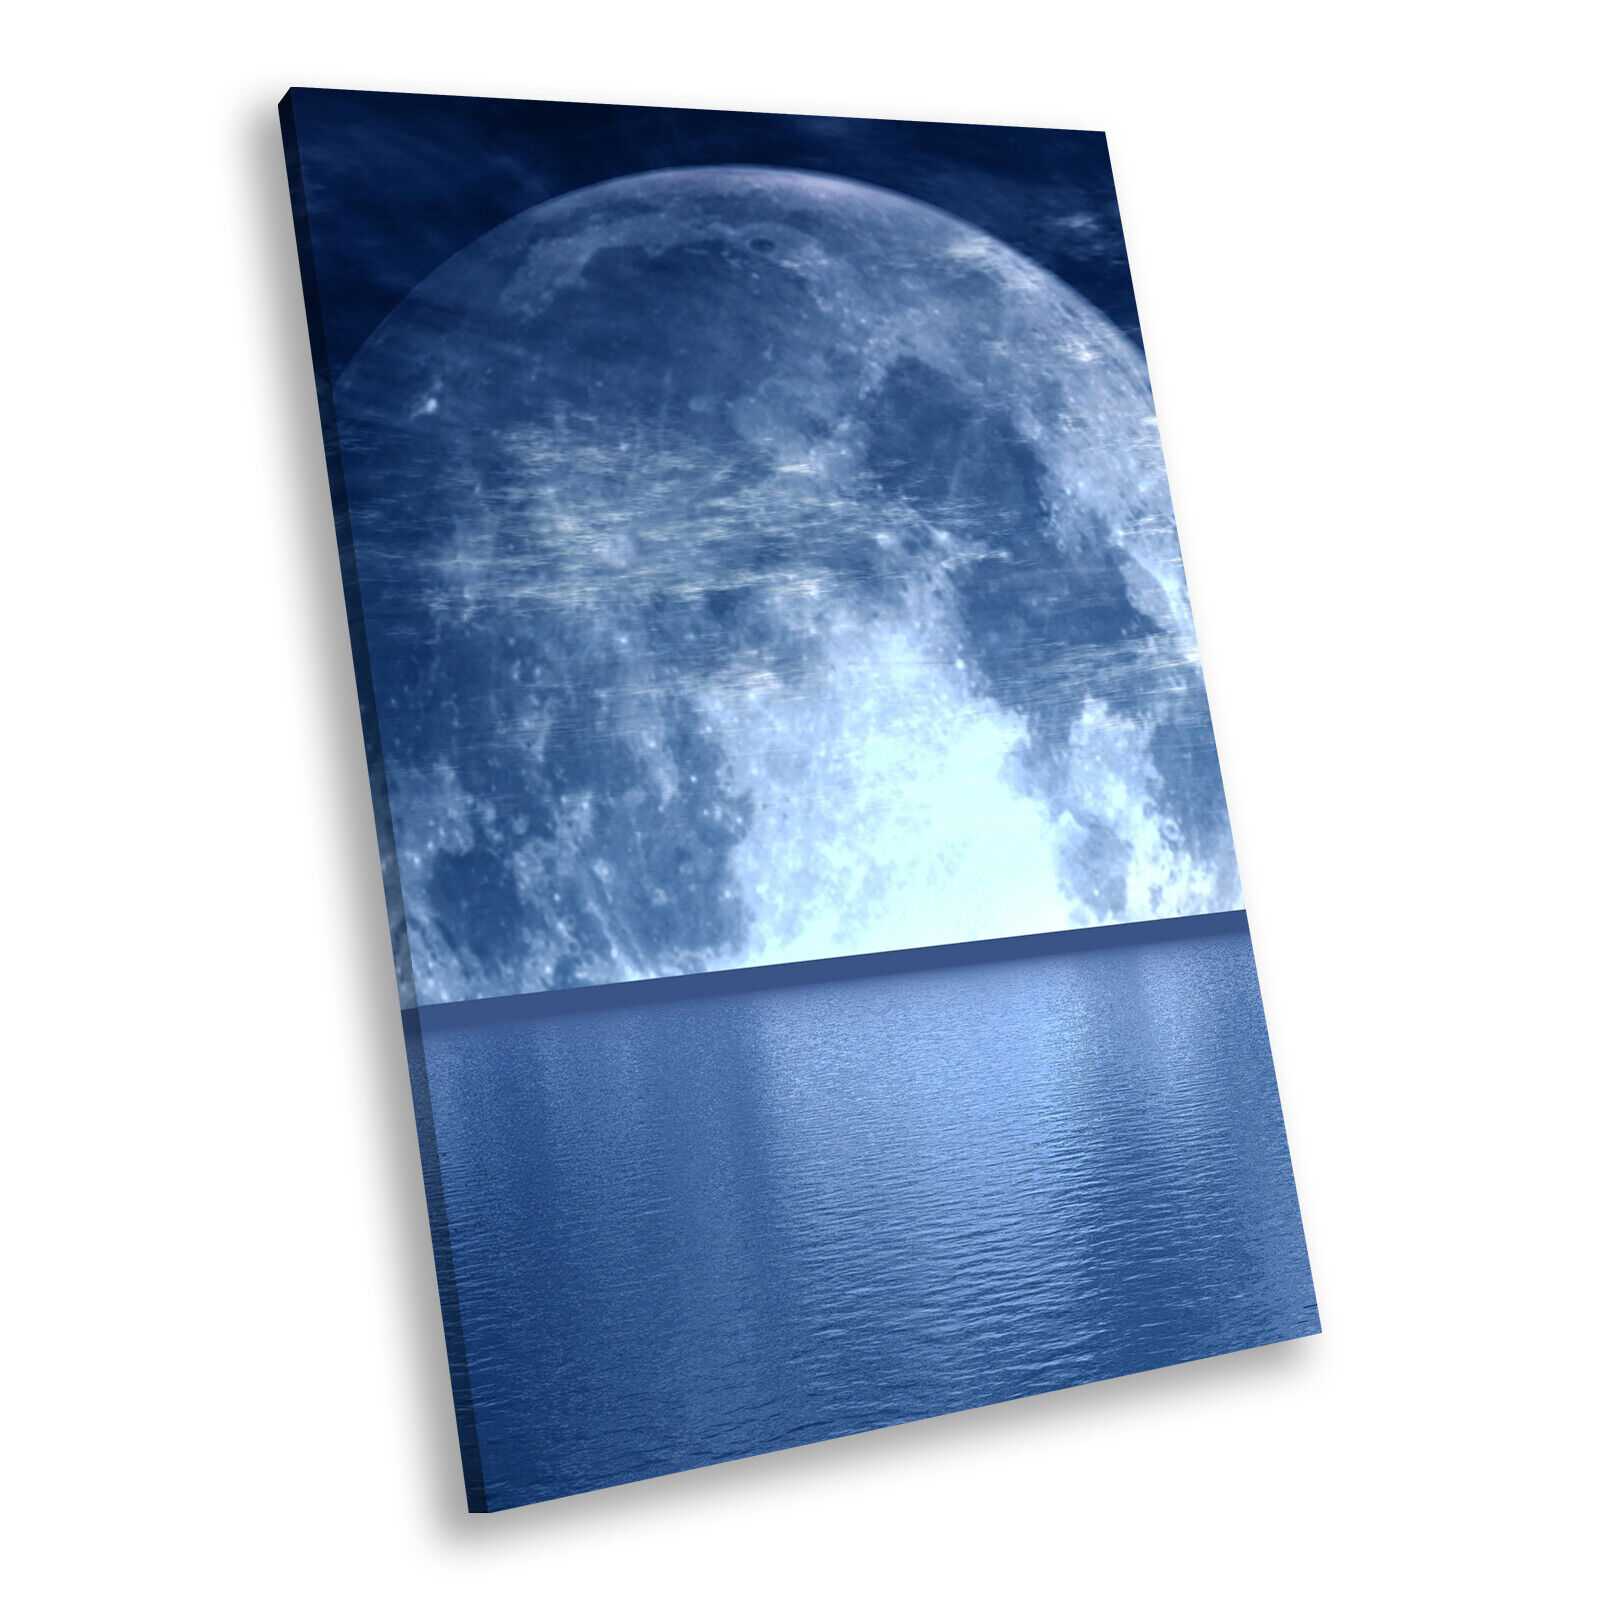 Blau Moon Ocean Nature Cool Portrait Scenic Canvas Wall Art Large Picture Prints